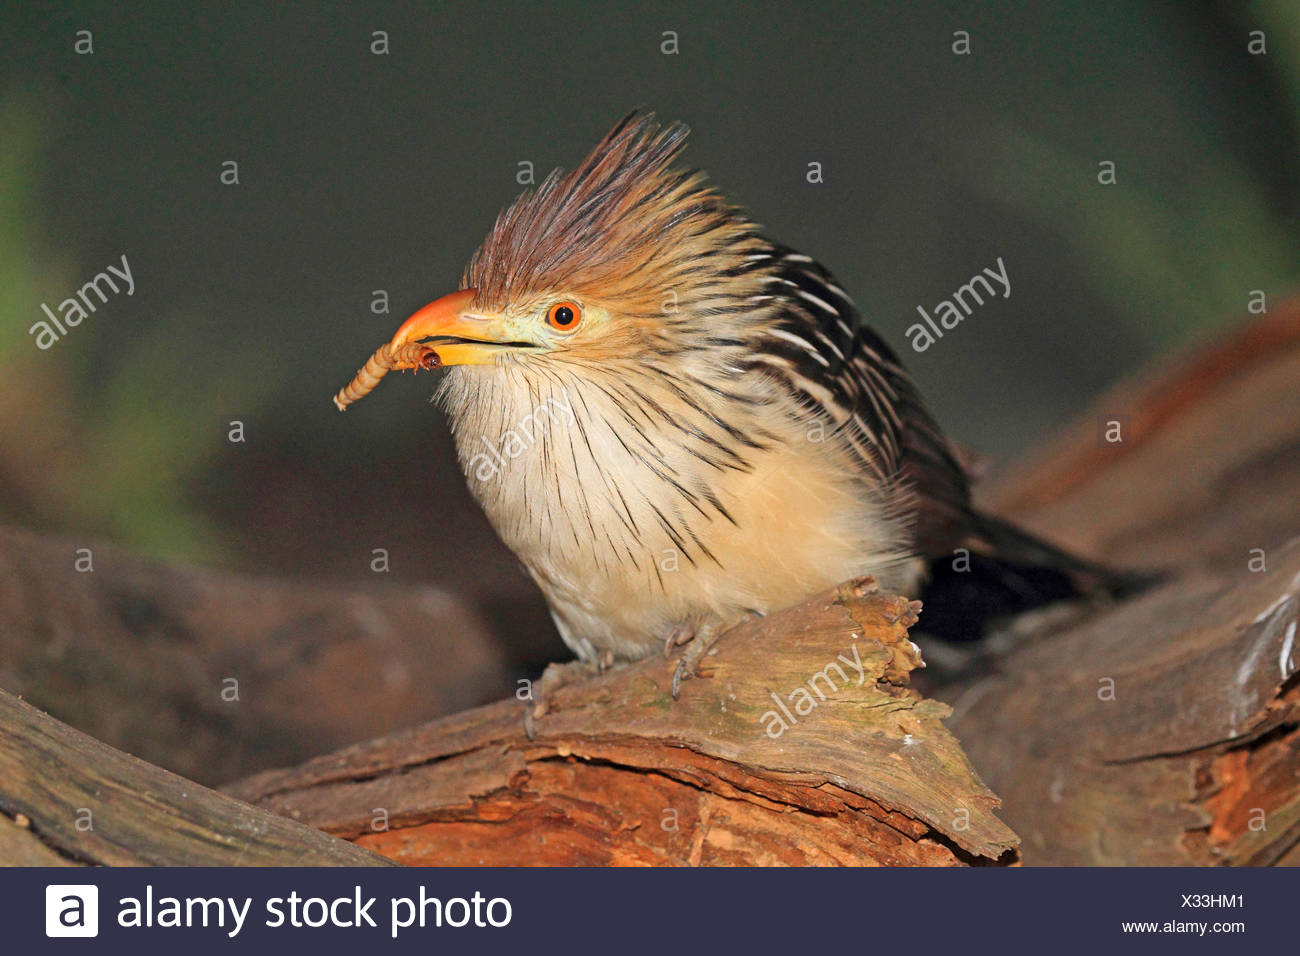 guira cuckoo (Guira guira), with larva in its bill - Stock Image